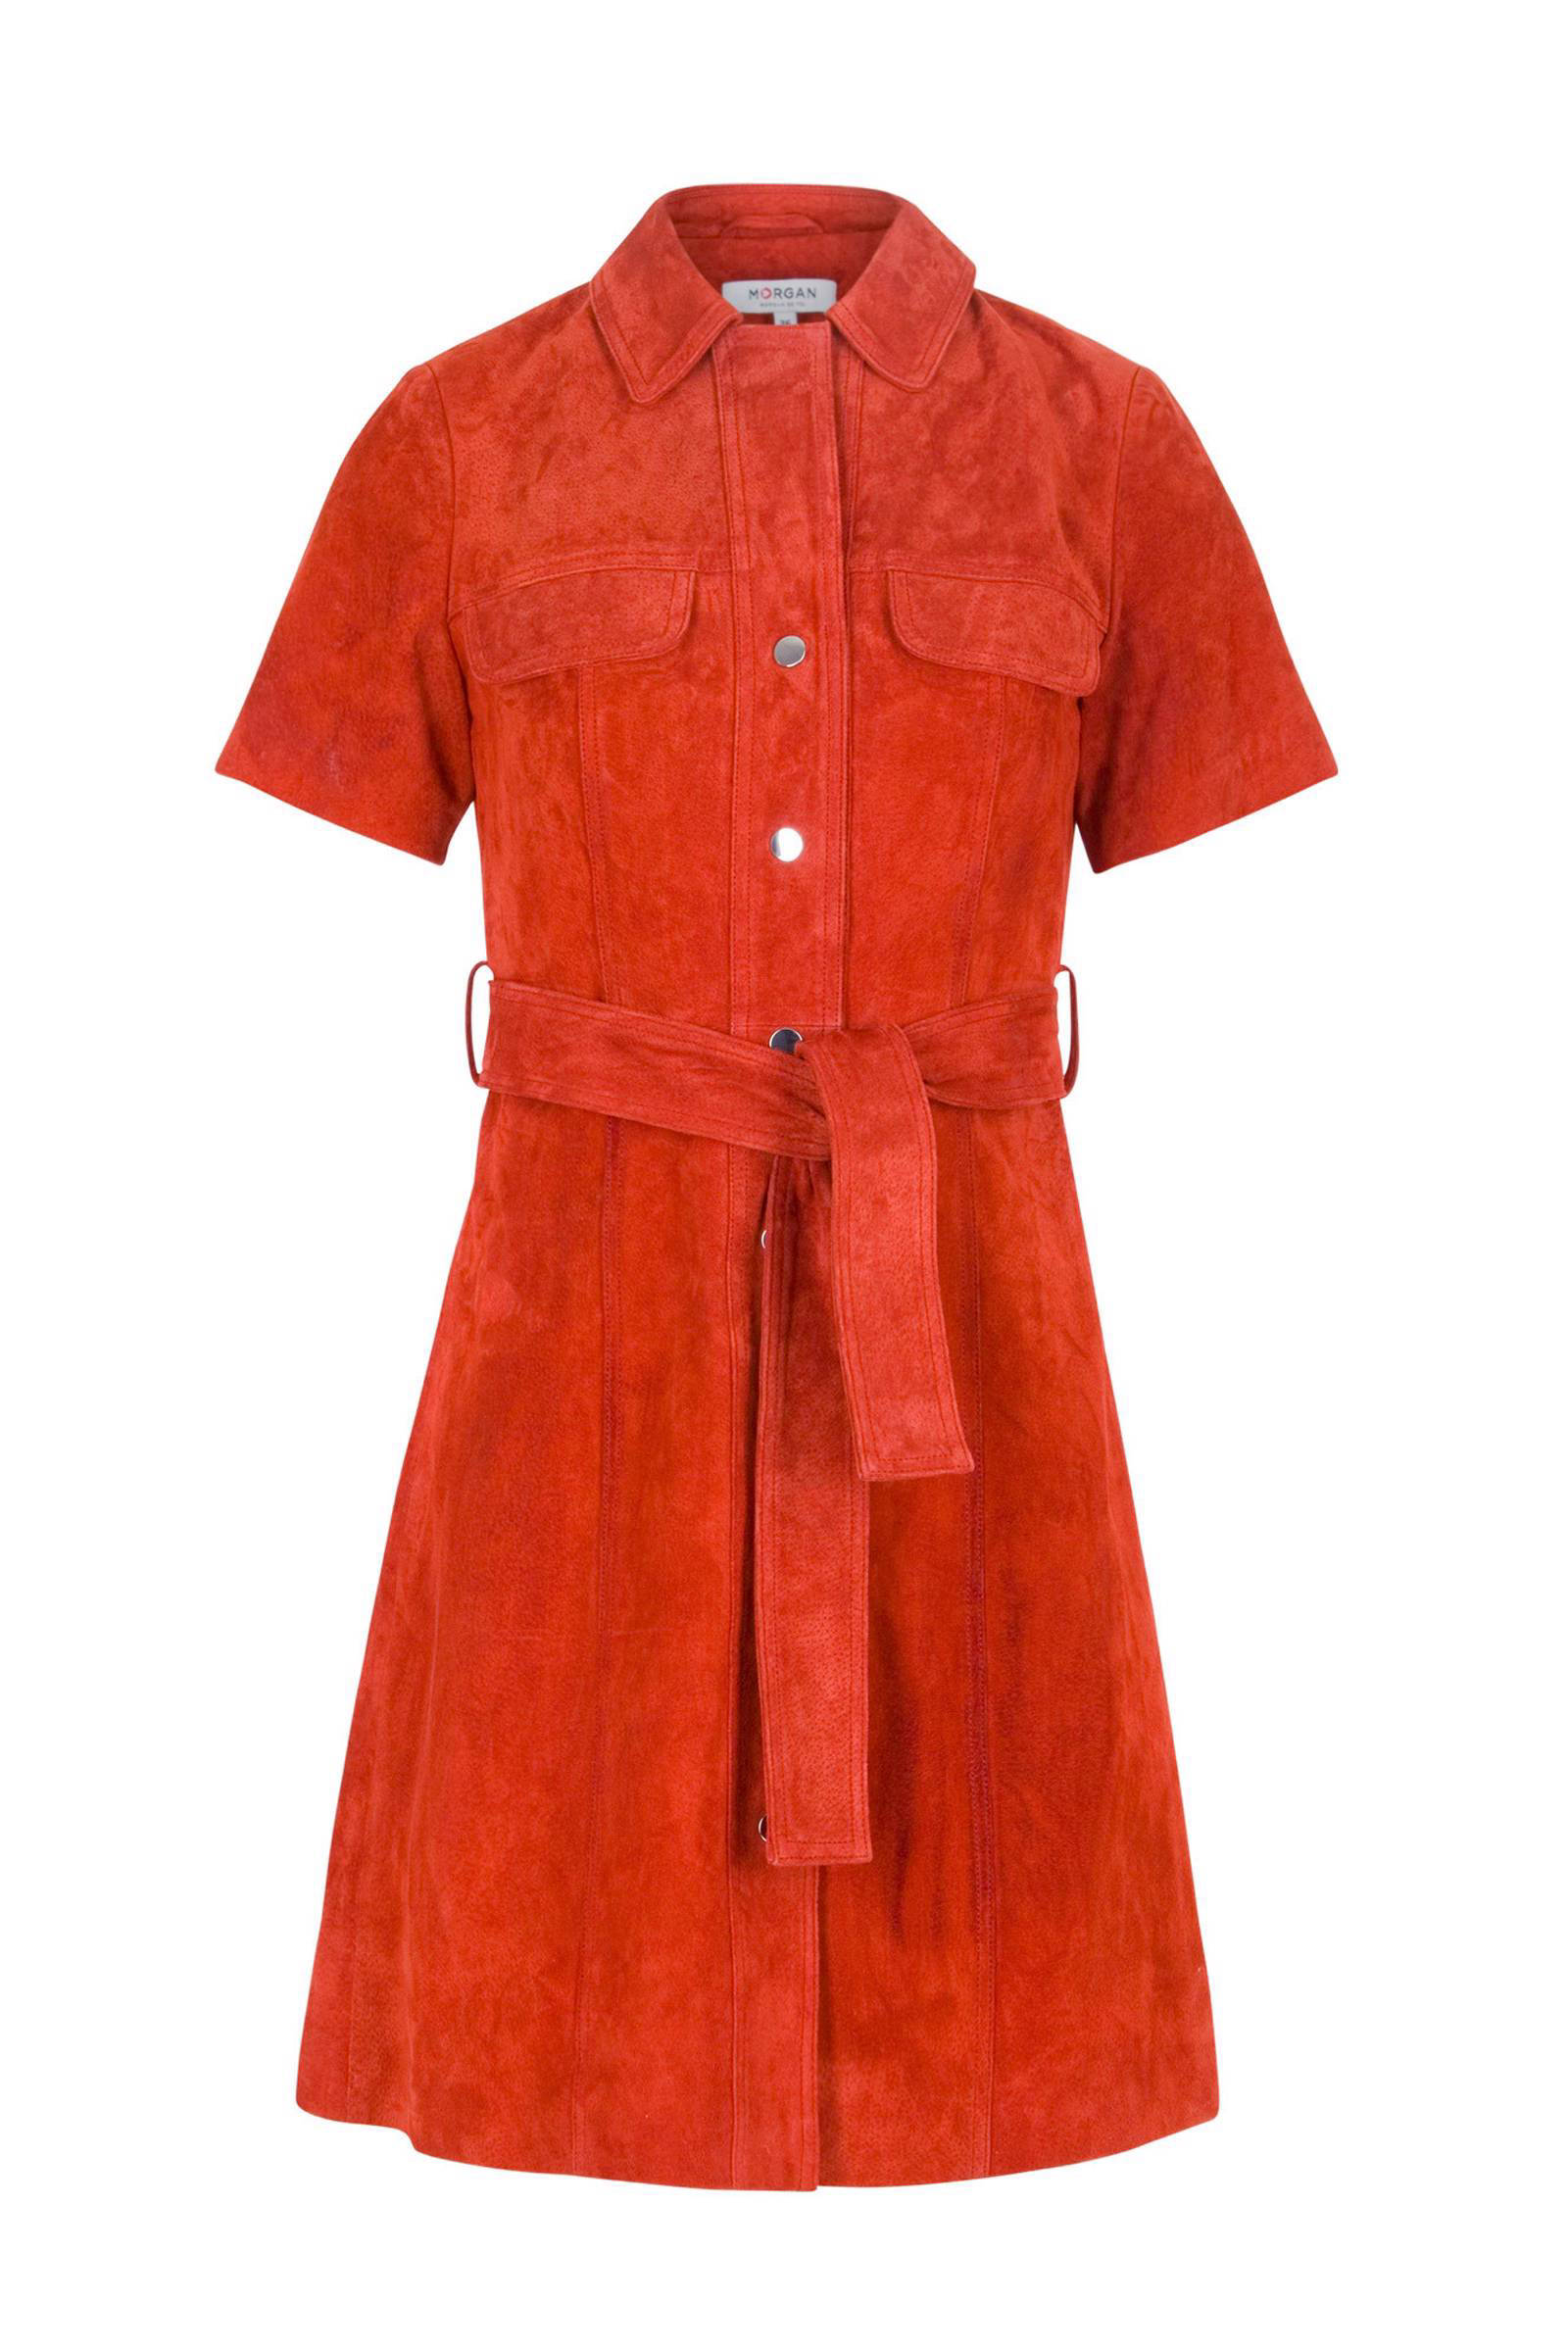 Morgan suède jurk roodoranje (dames)